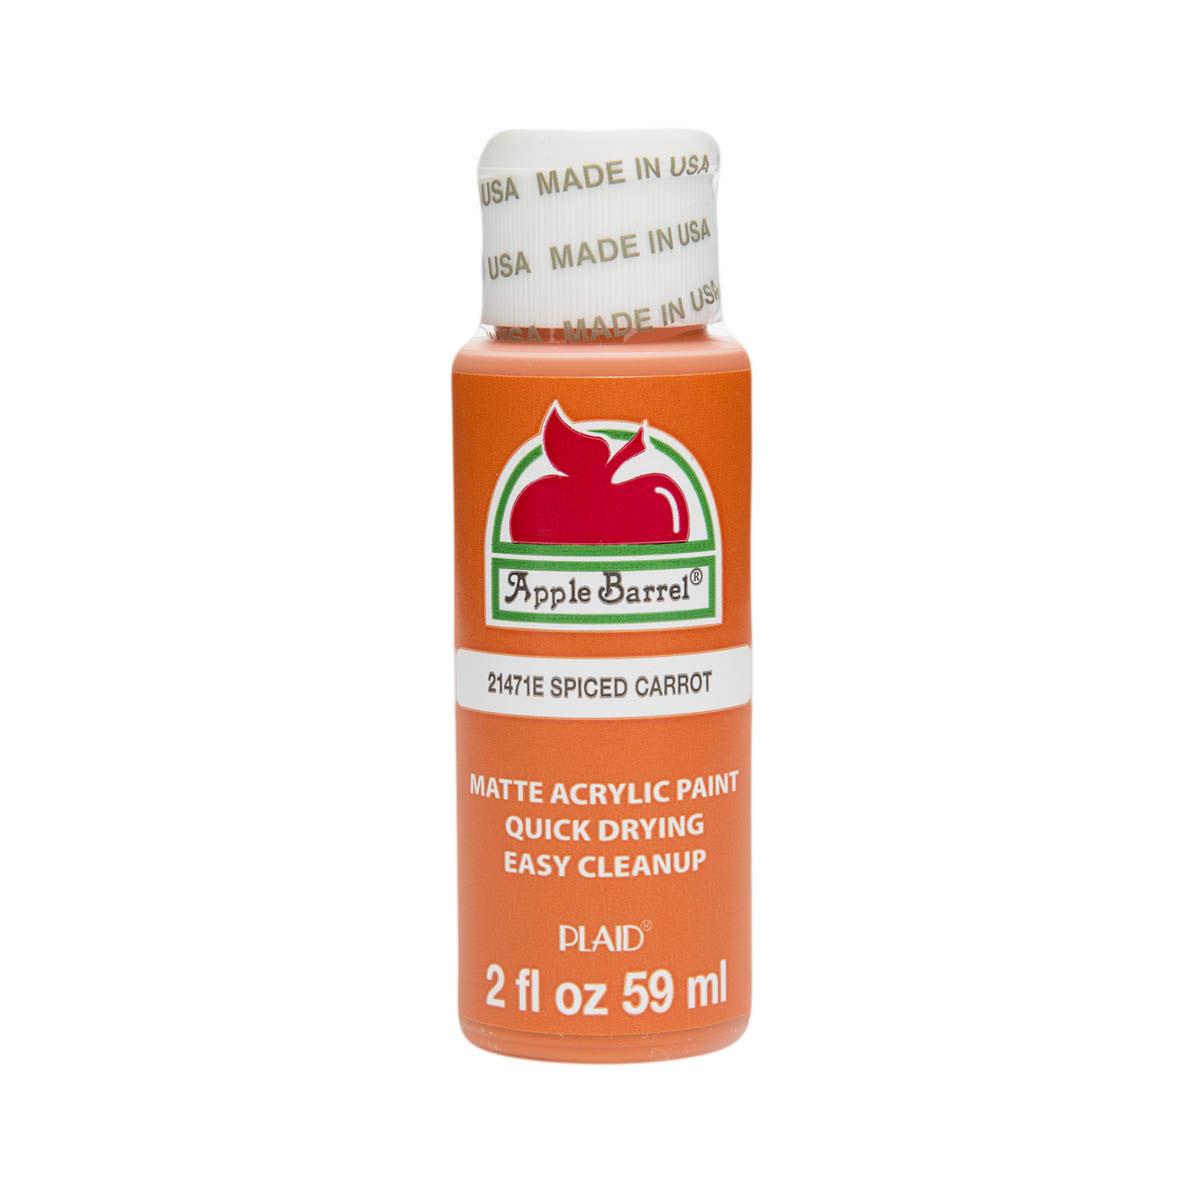 Apple Barrel ® Colors - Spiced Carrot, 2 oz. - 21471